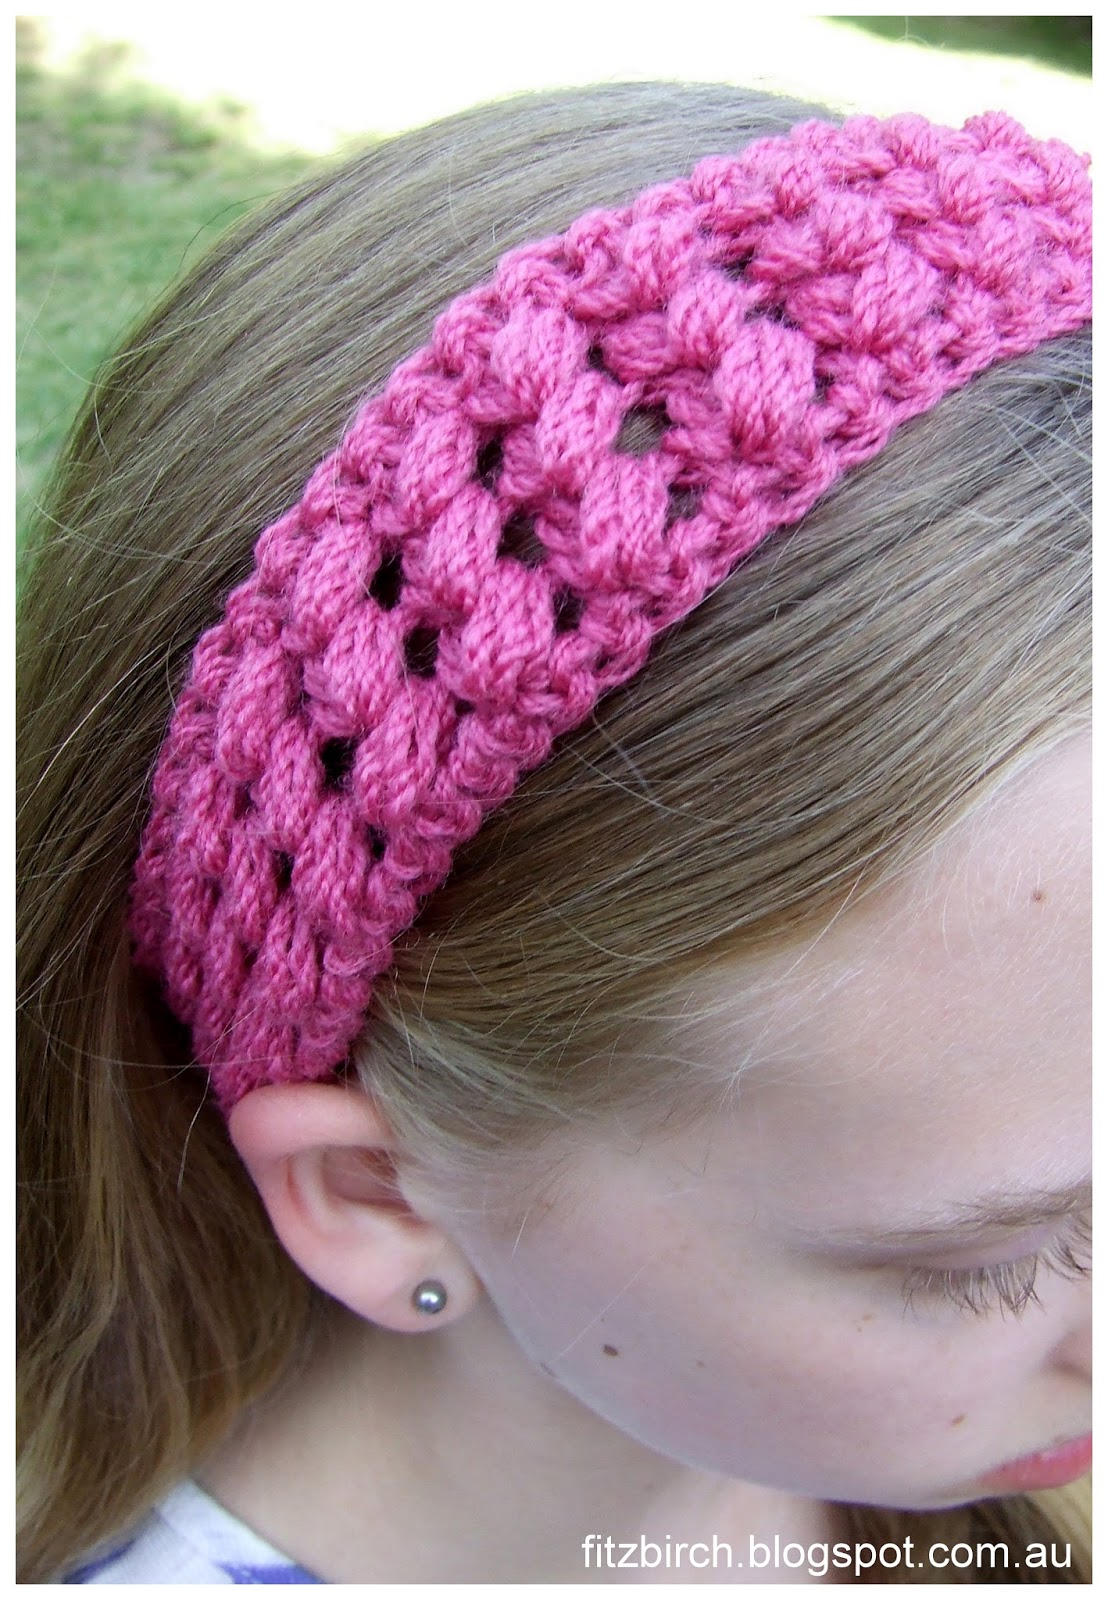 Fitzbirch Crafts Free Crochet Patterns